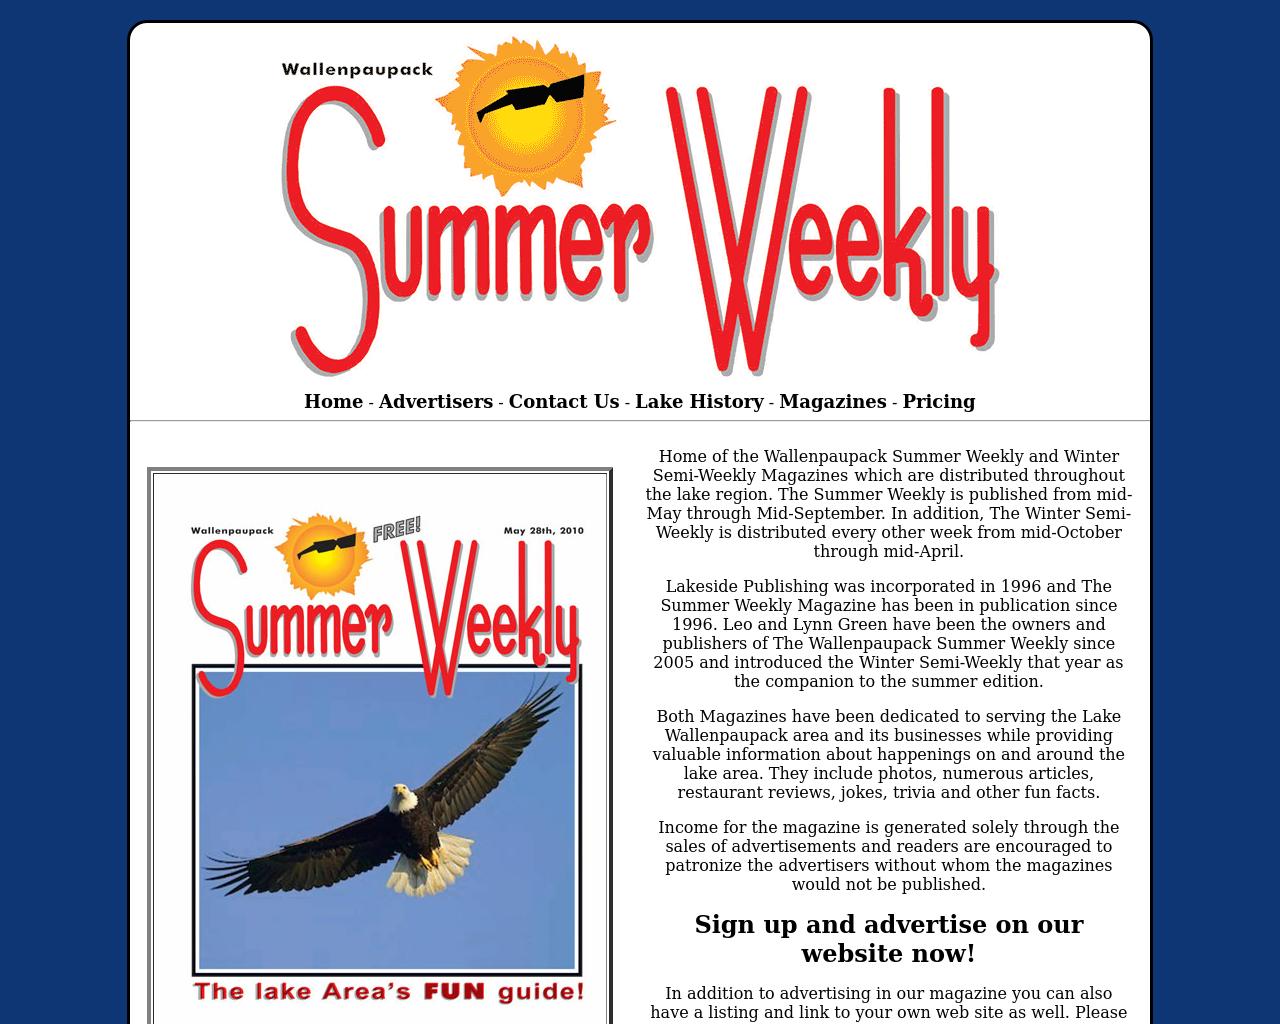 Summer-Weekly-Advertising-Reviews-Pricing